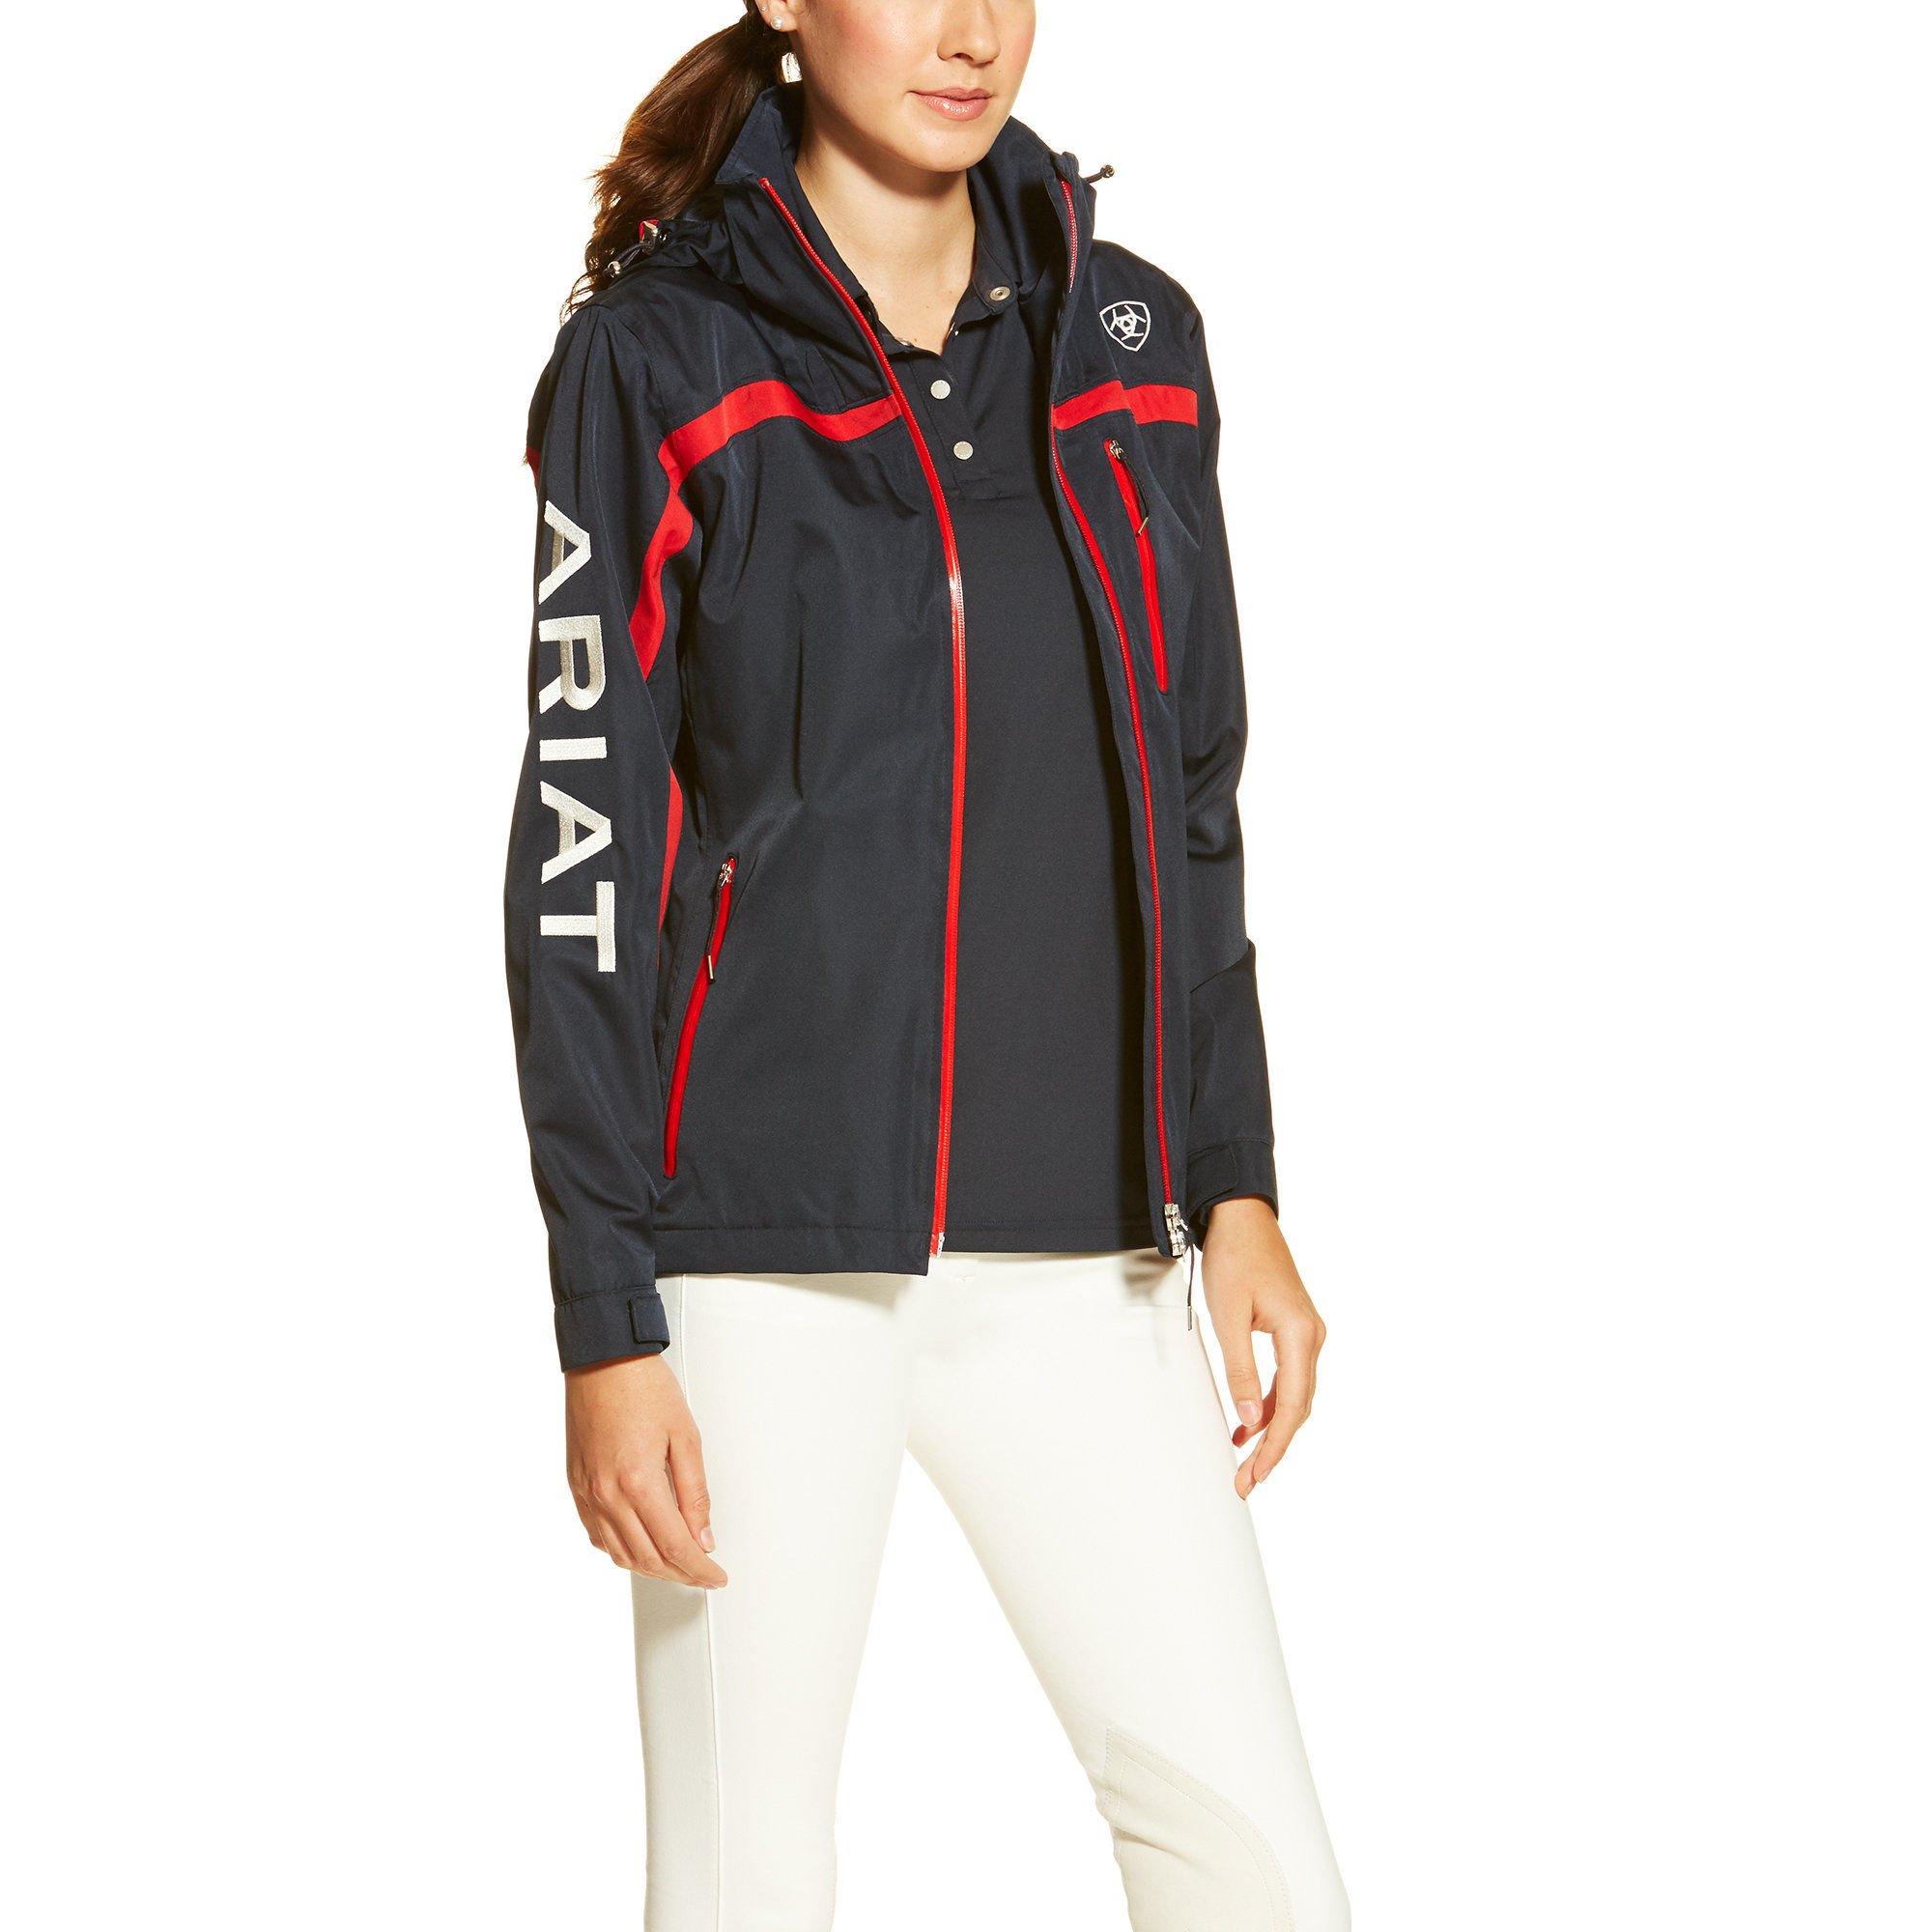 Ariat Womens Team II Waterproof Jacket Small Navy by Ariat